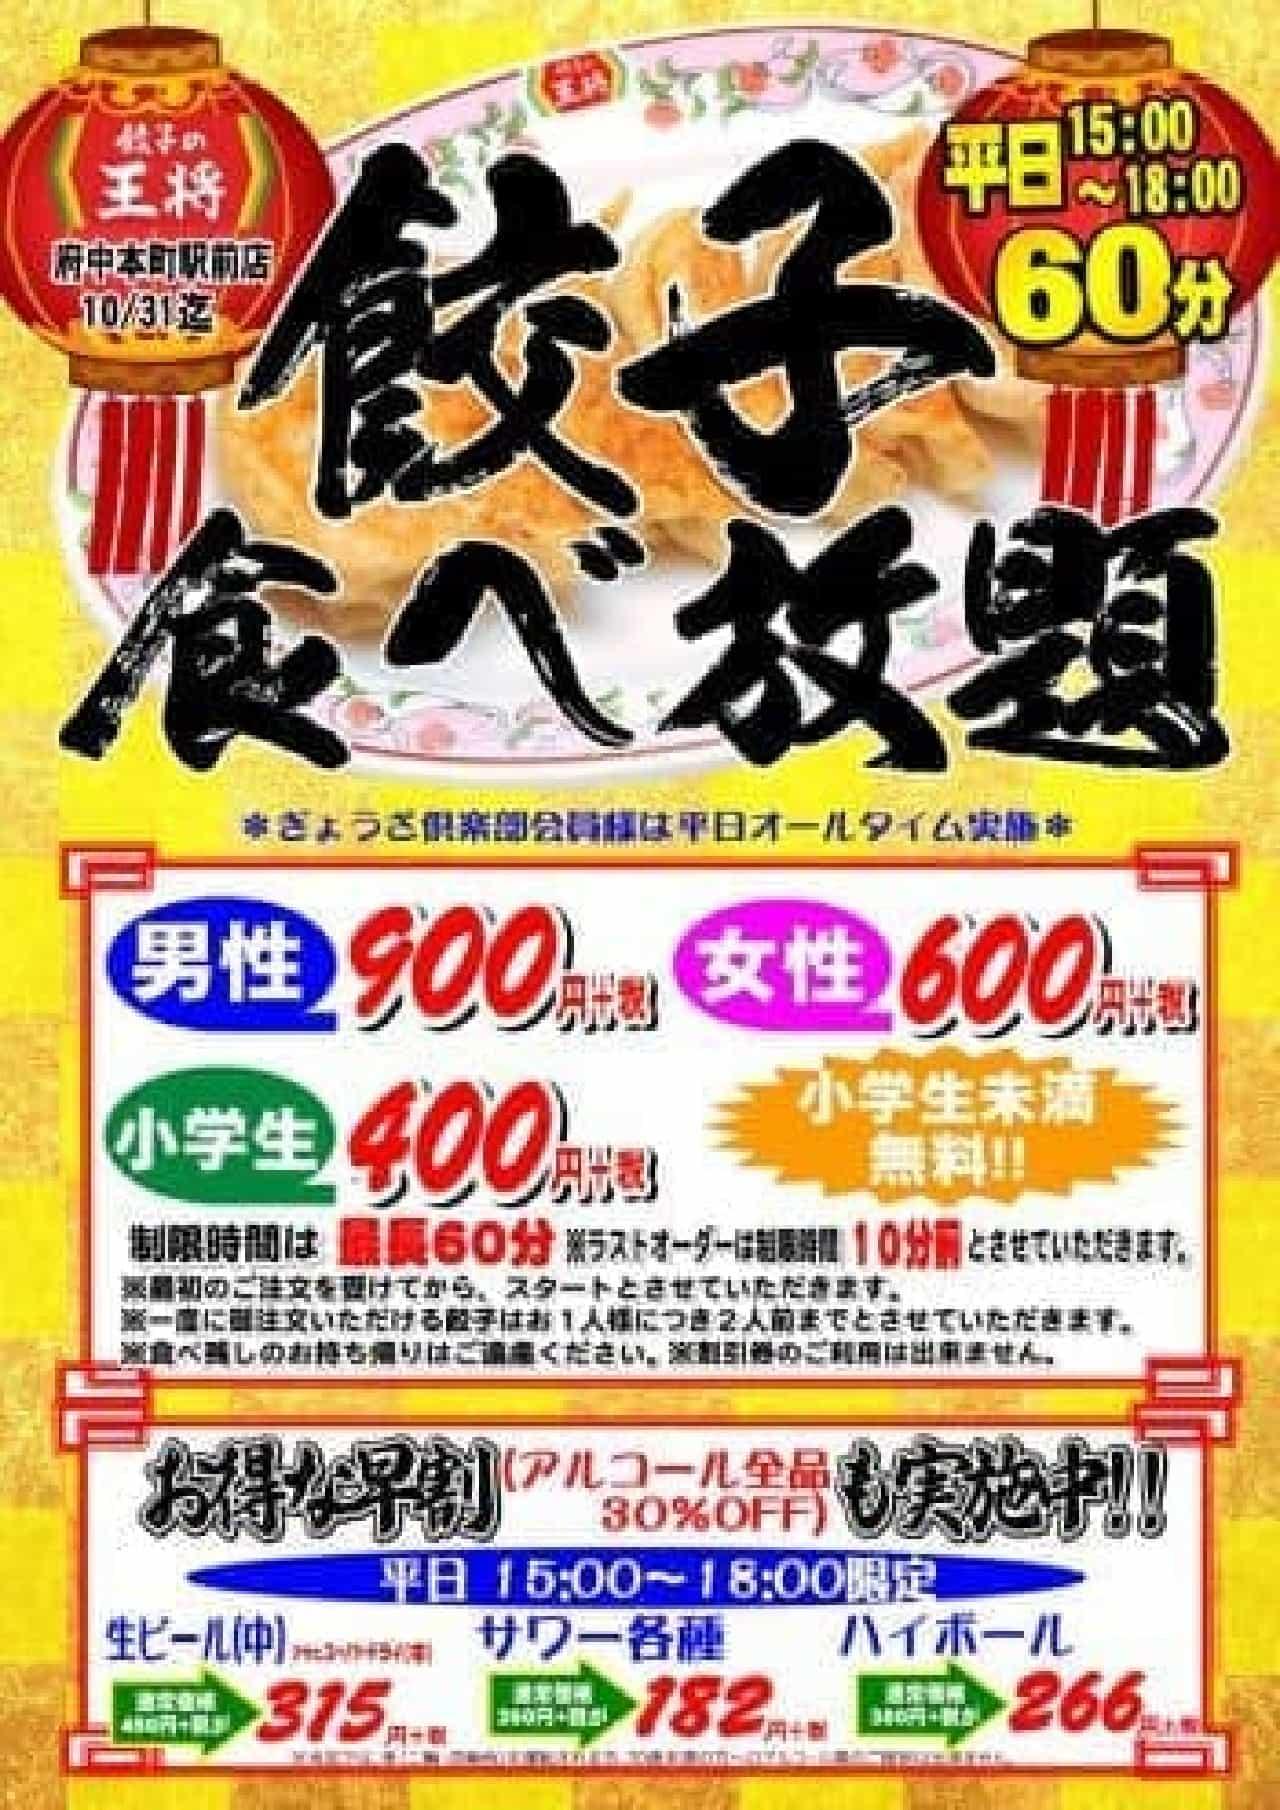 餃子の王将 府中本町駅前店で「餃子食べ放題」